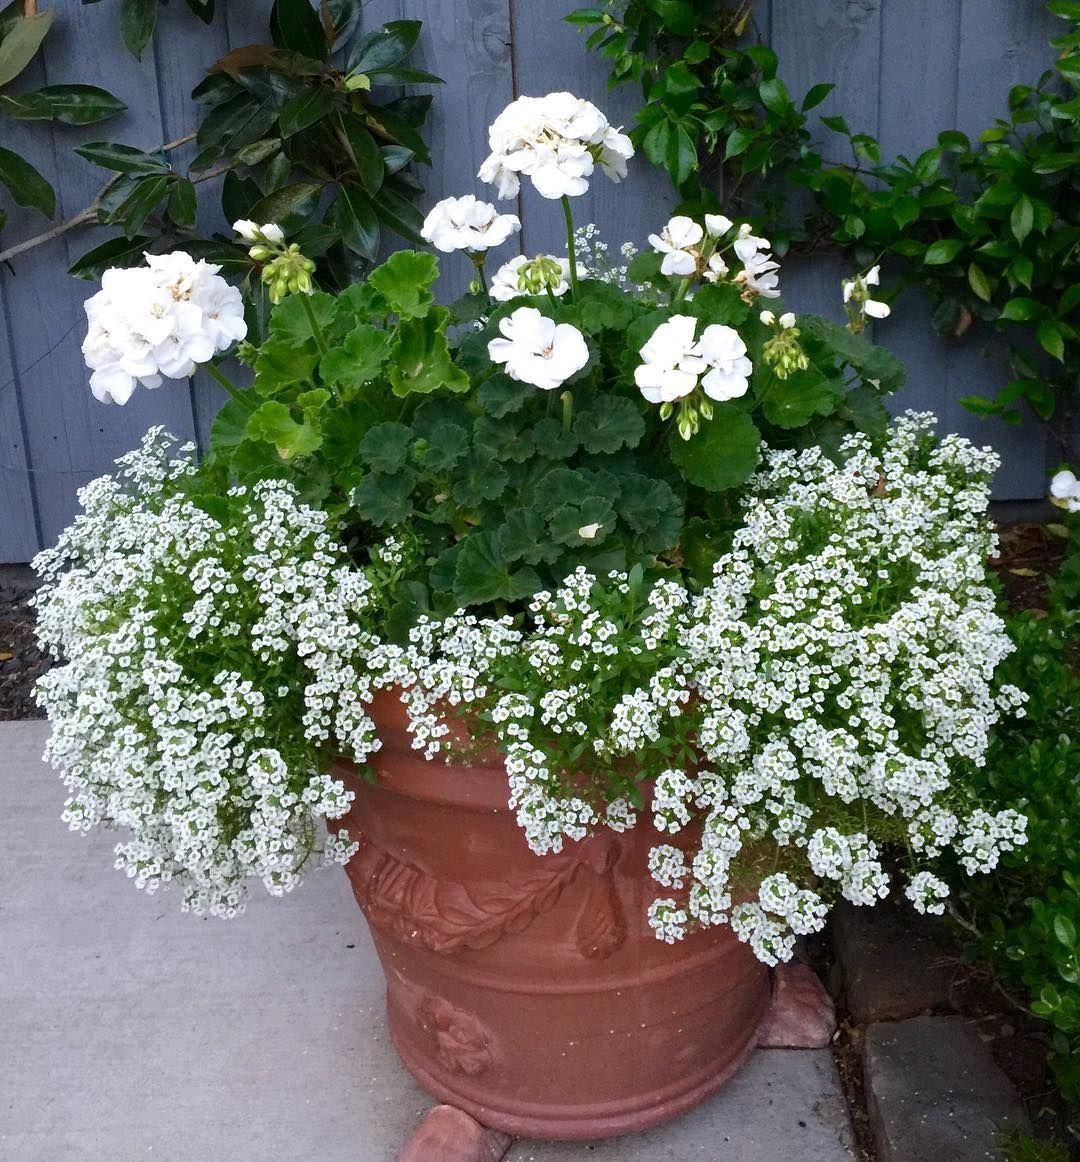 geranium for Japanese beetles and alyssum